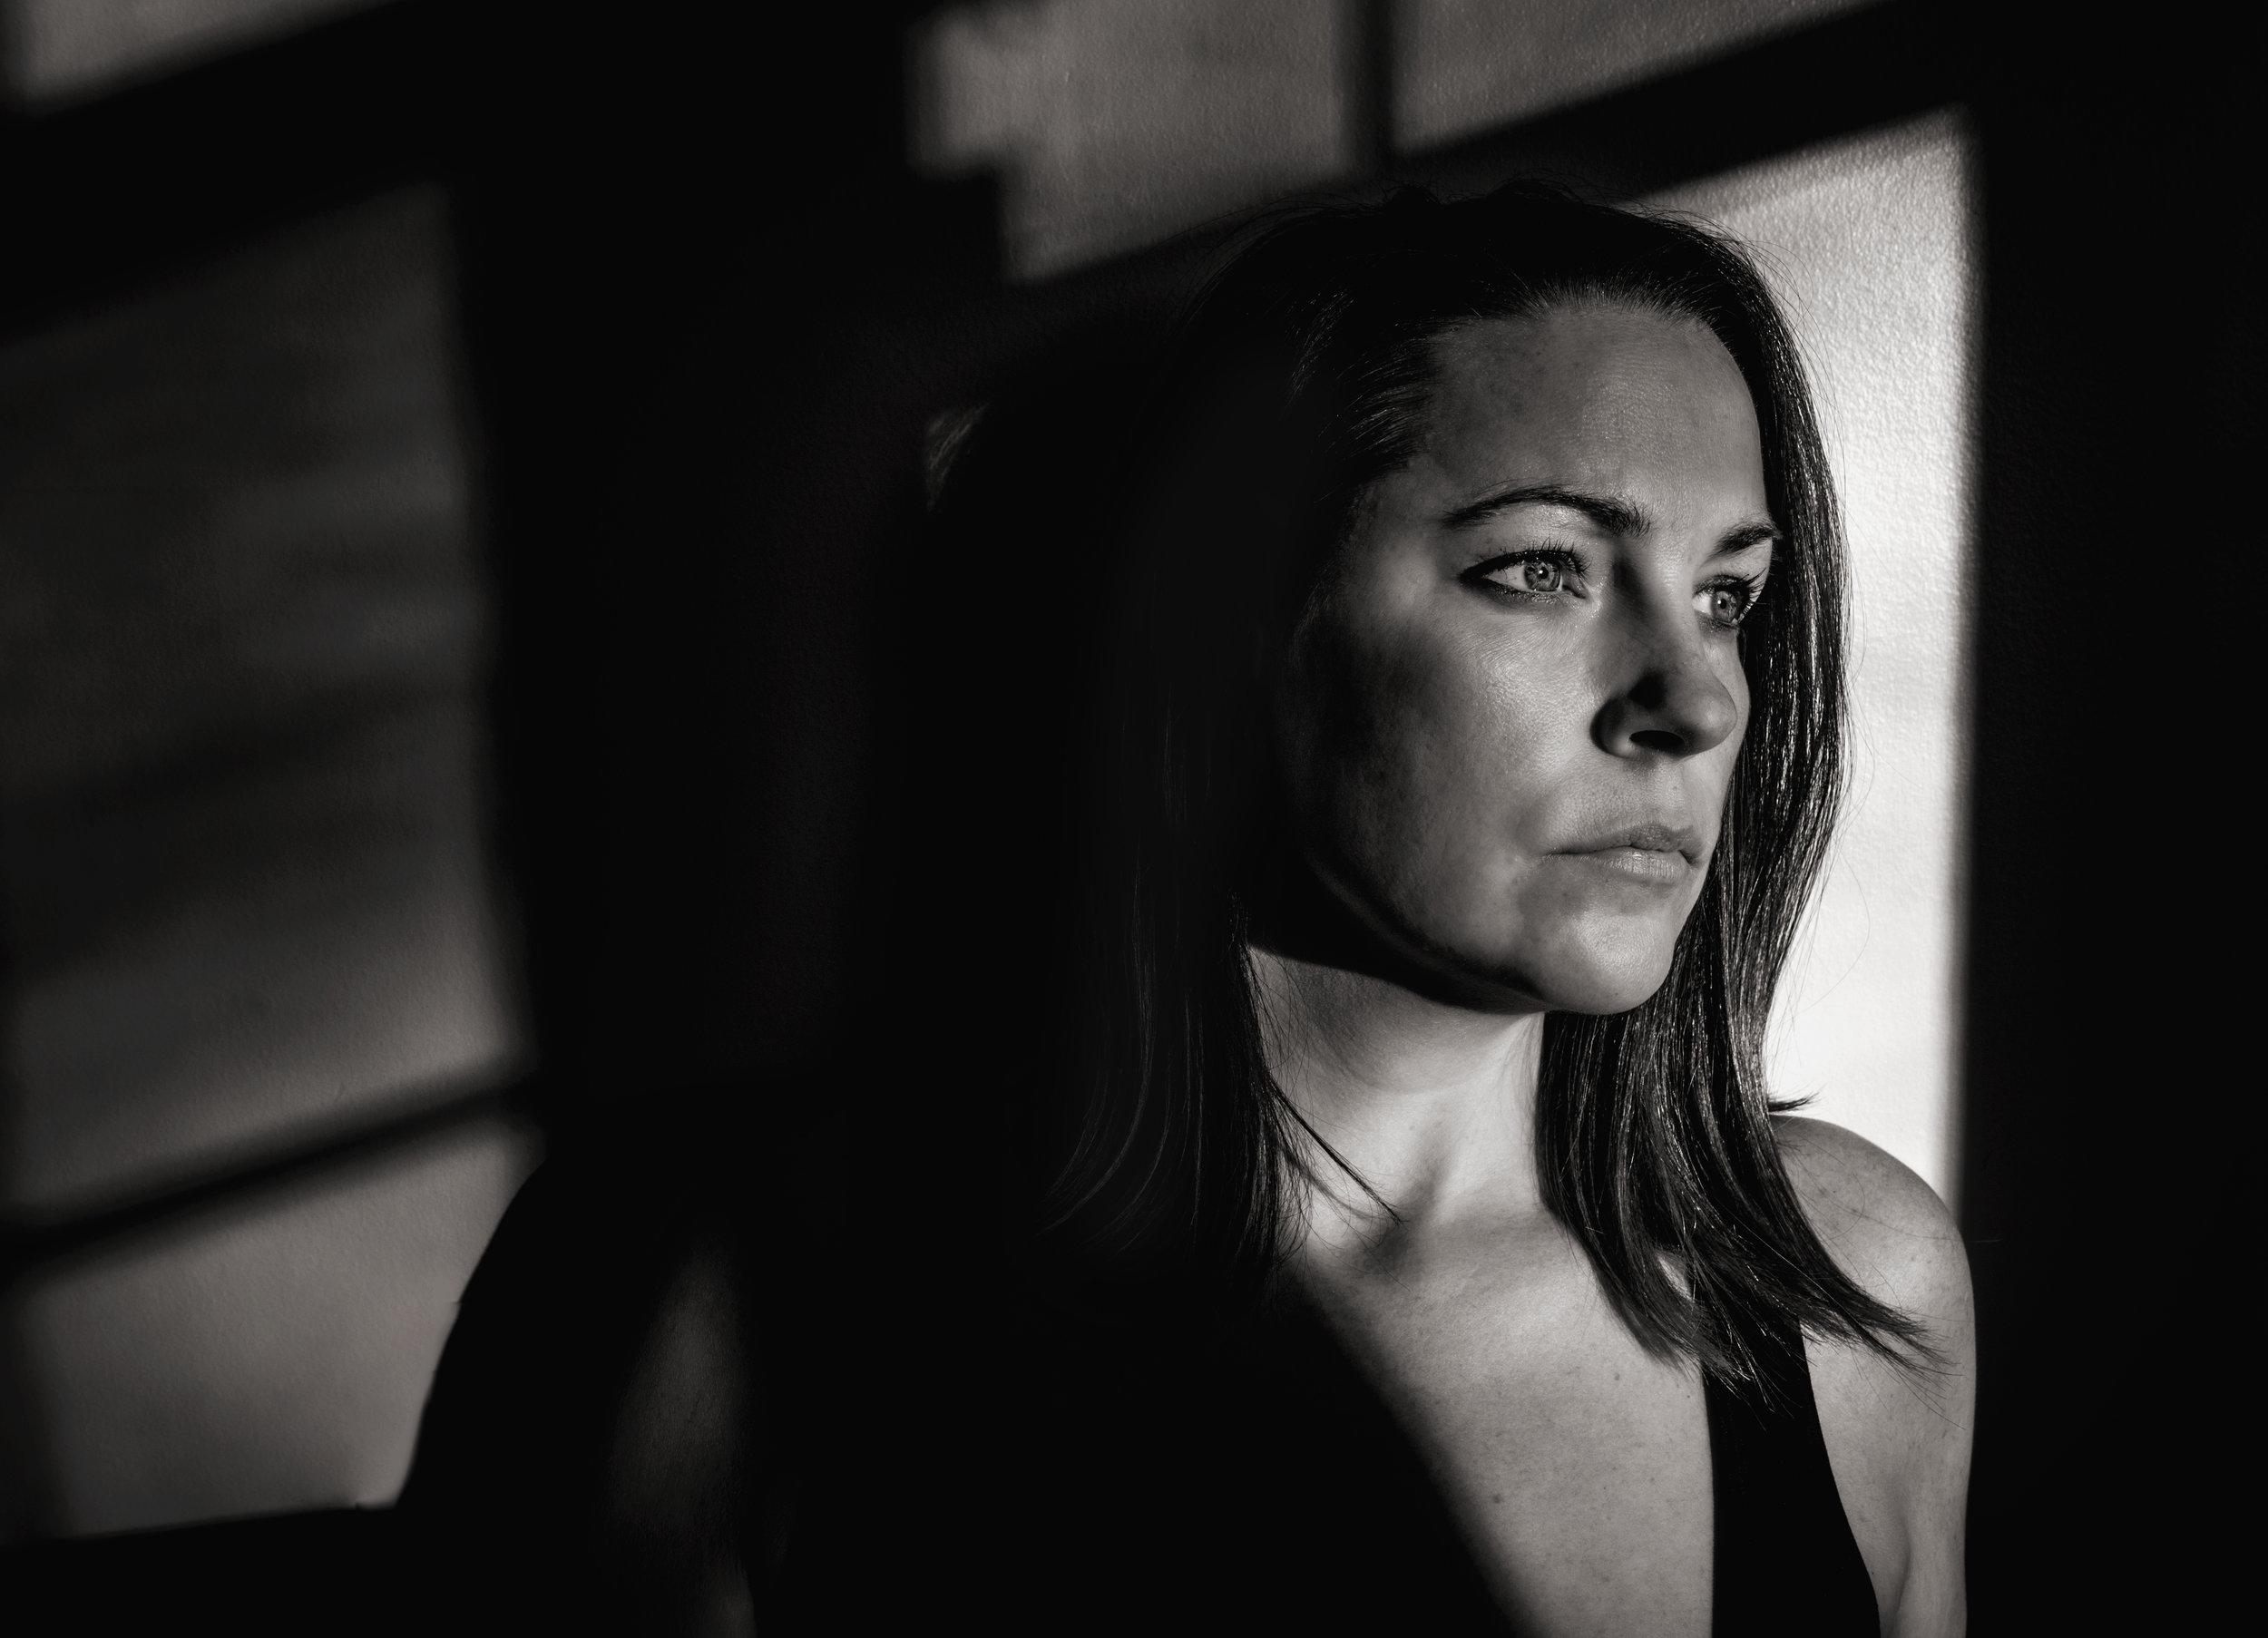 lifestyle & documentary photographer